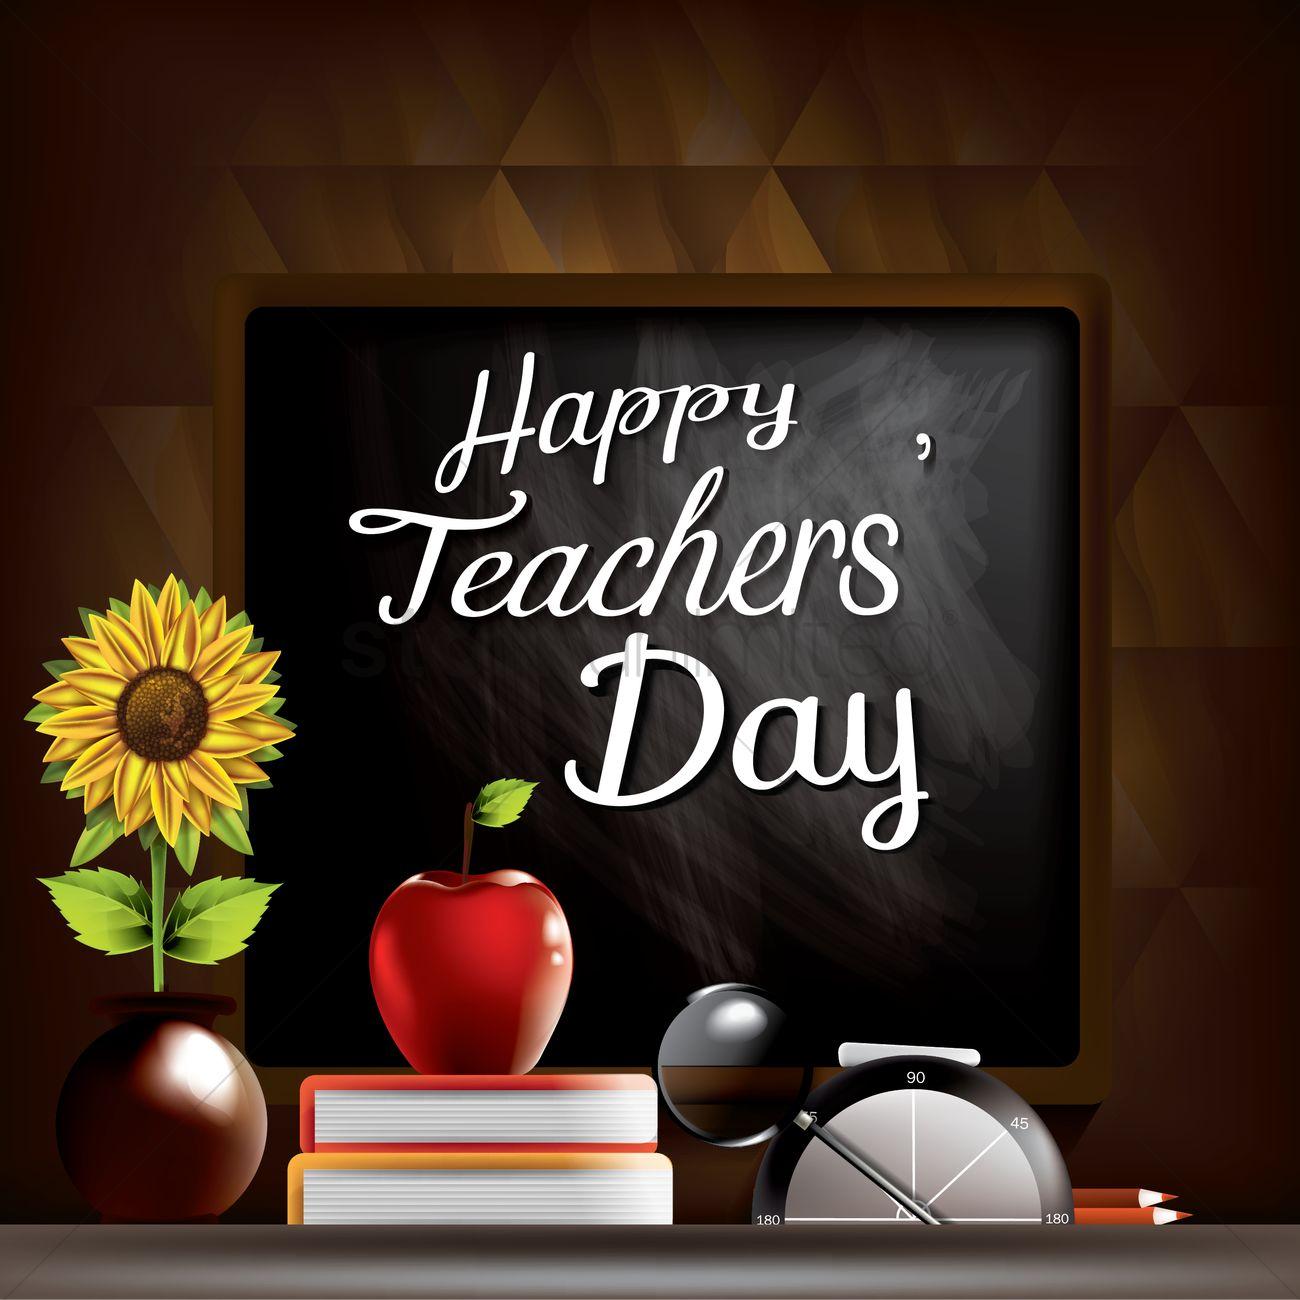 Teachers Day Concept Vector Image